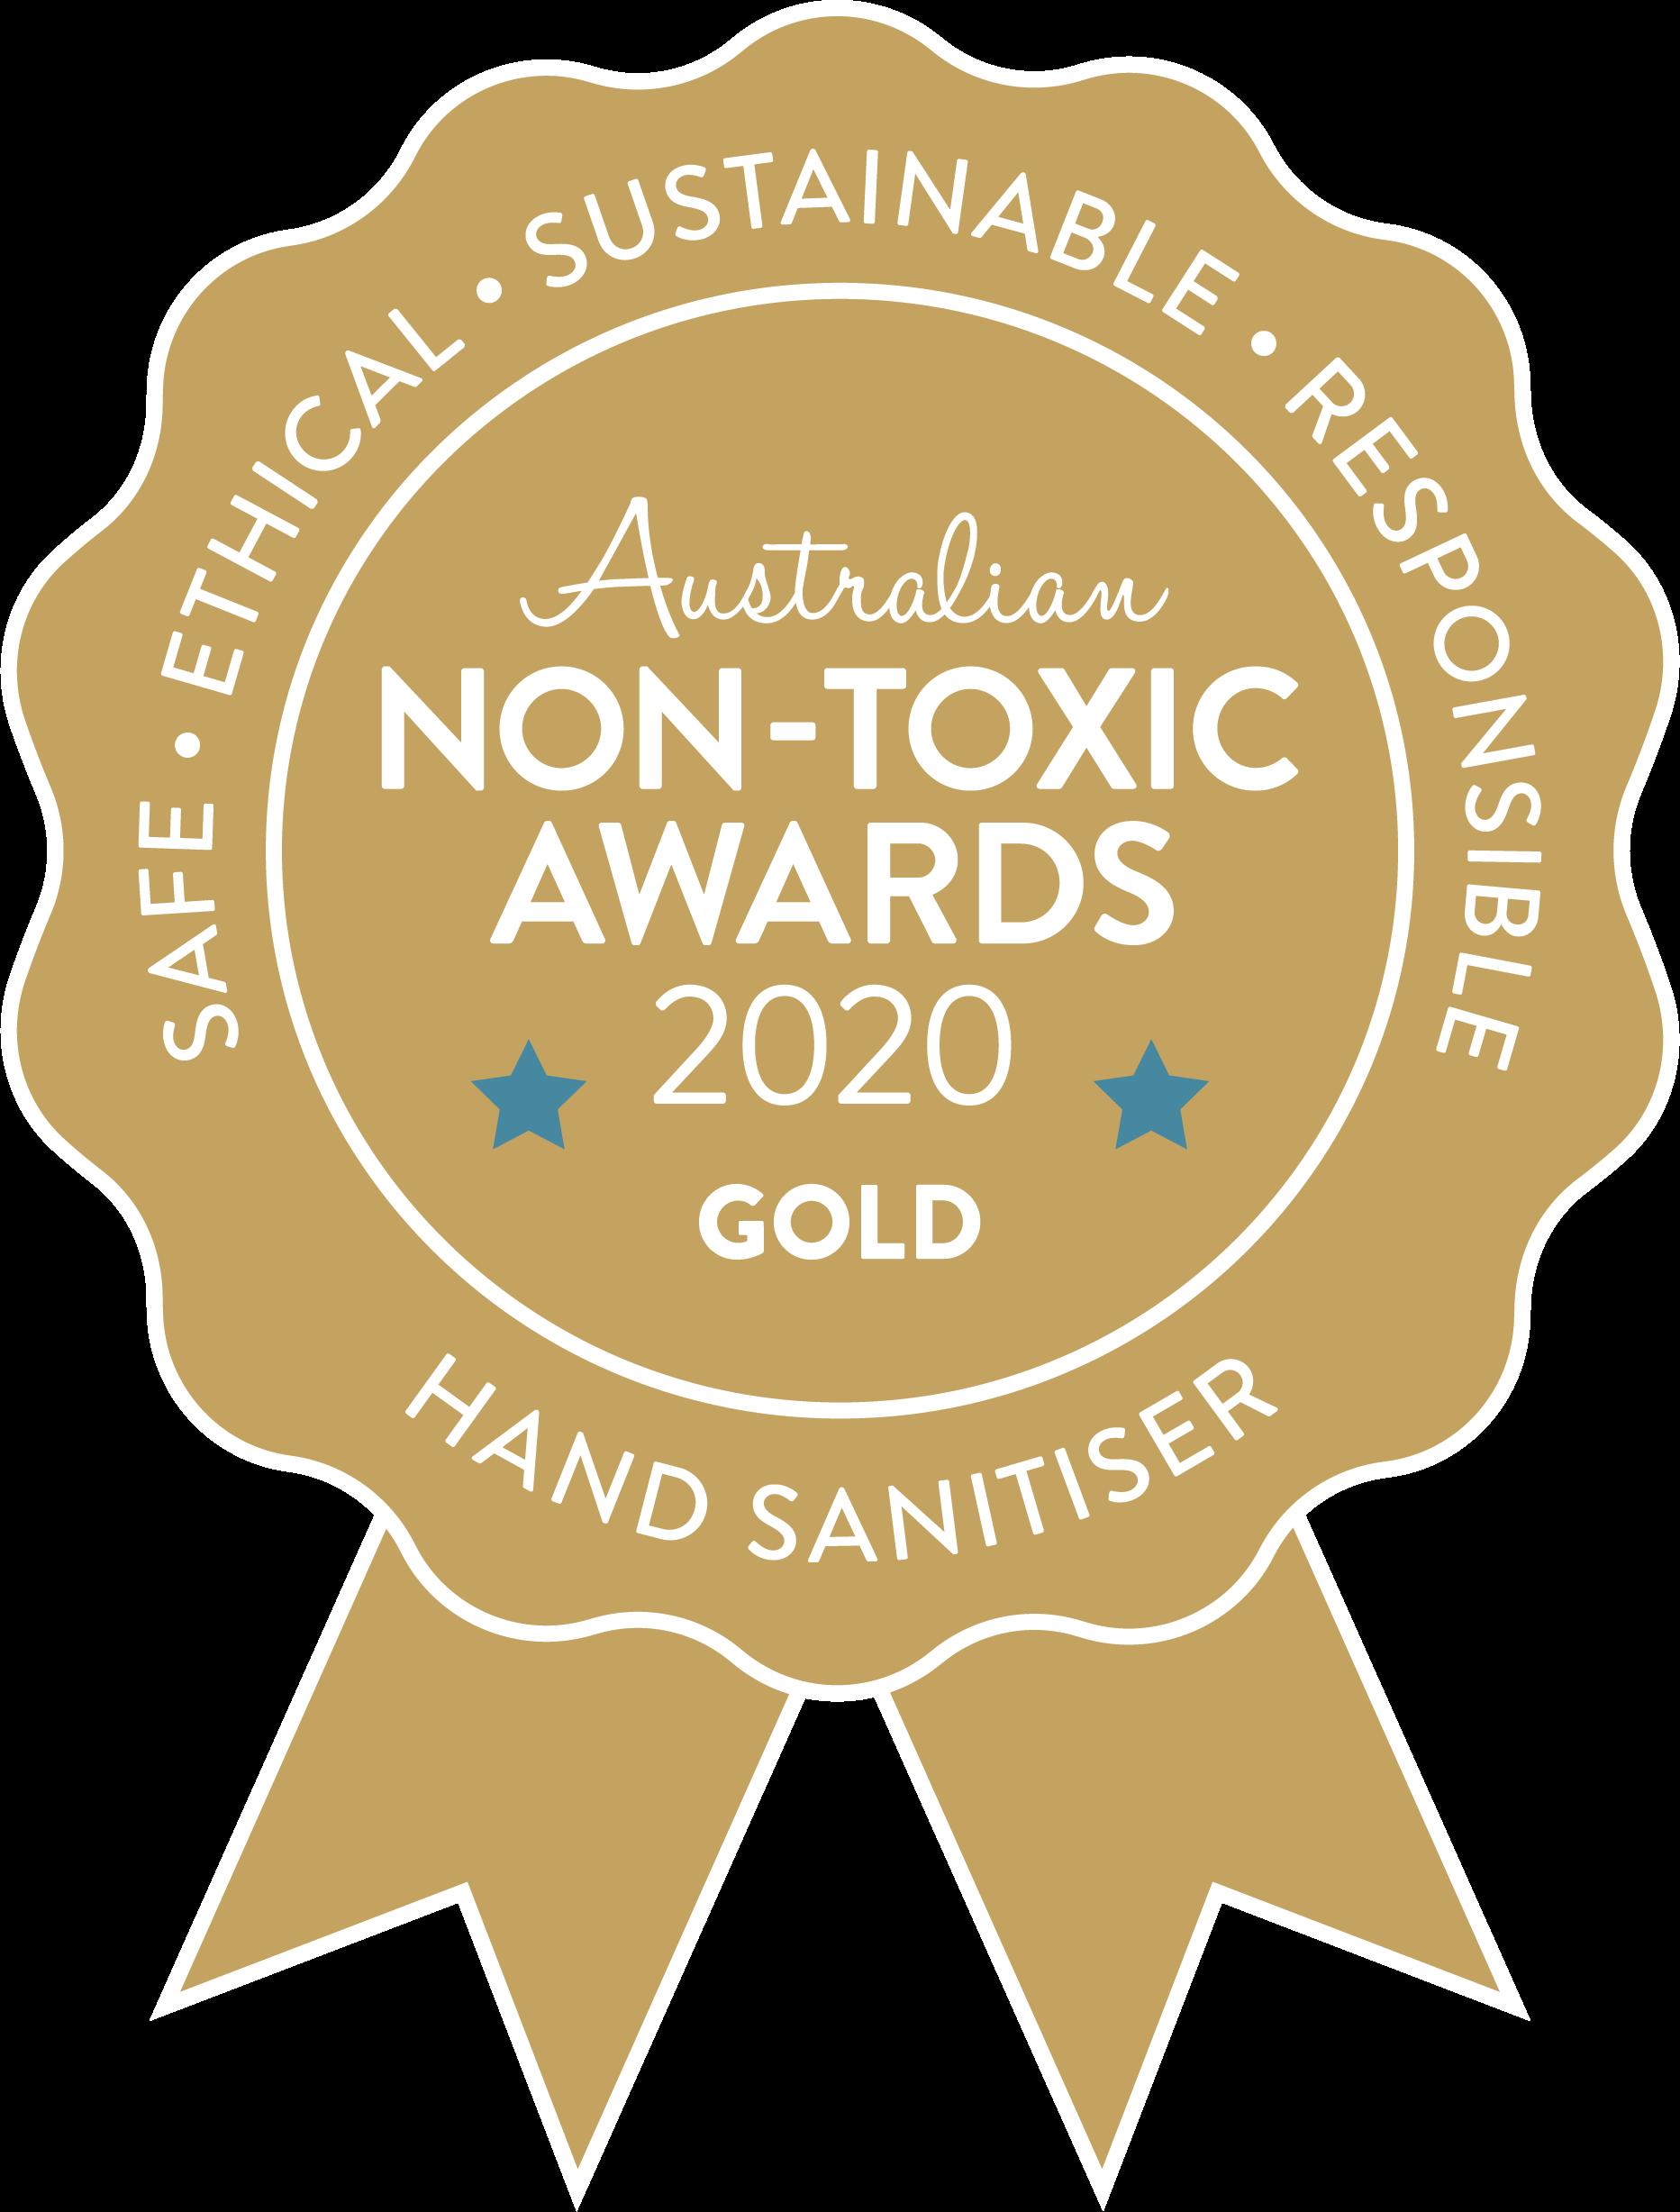 Australian Non-toxic Awards 2020 Gold Hand Sanitiser